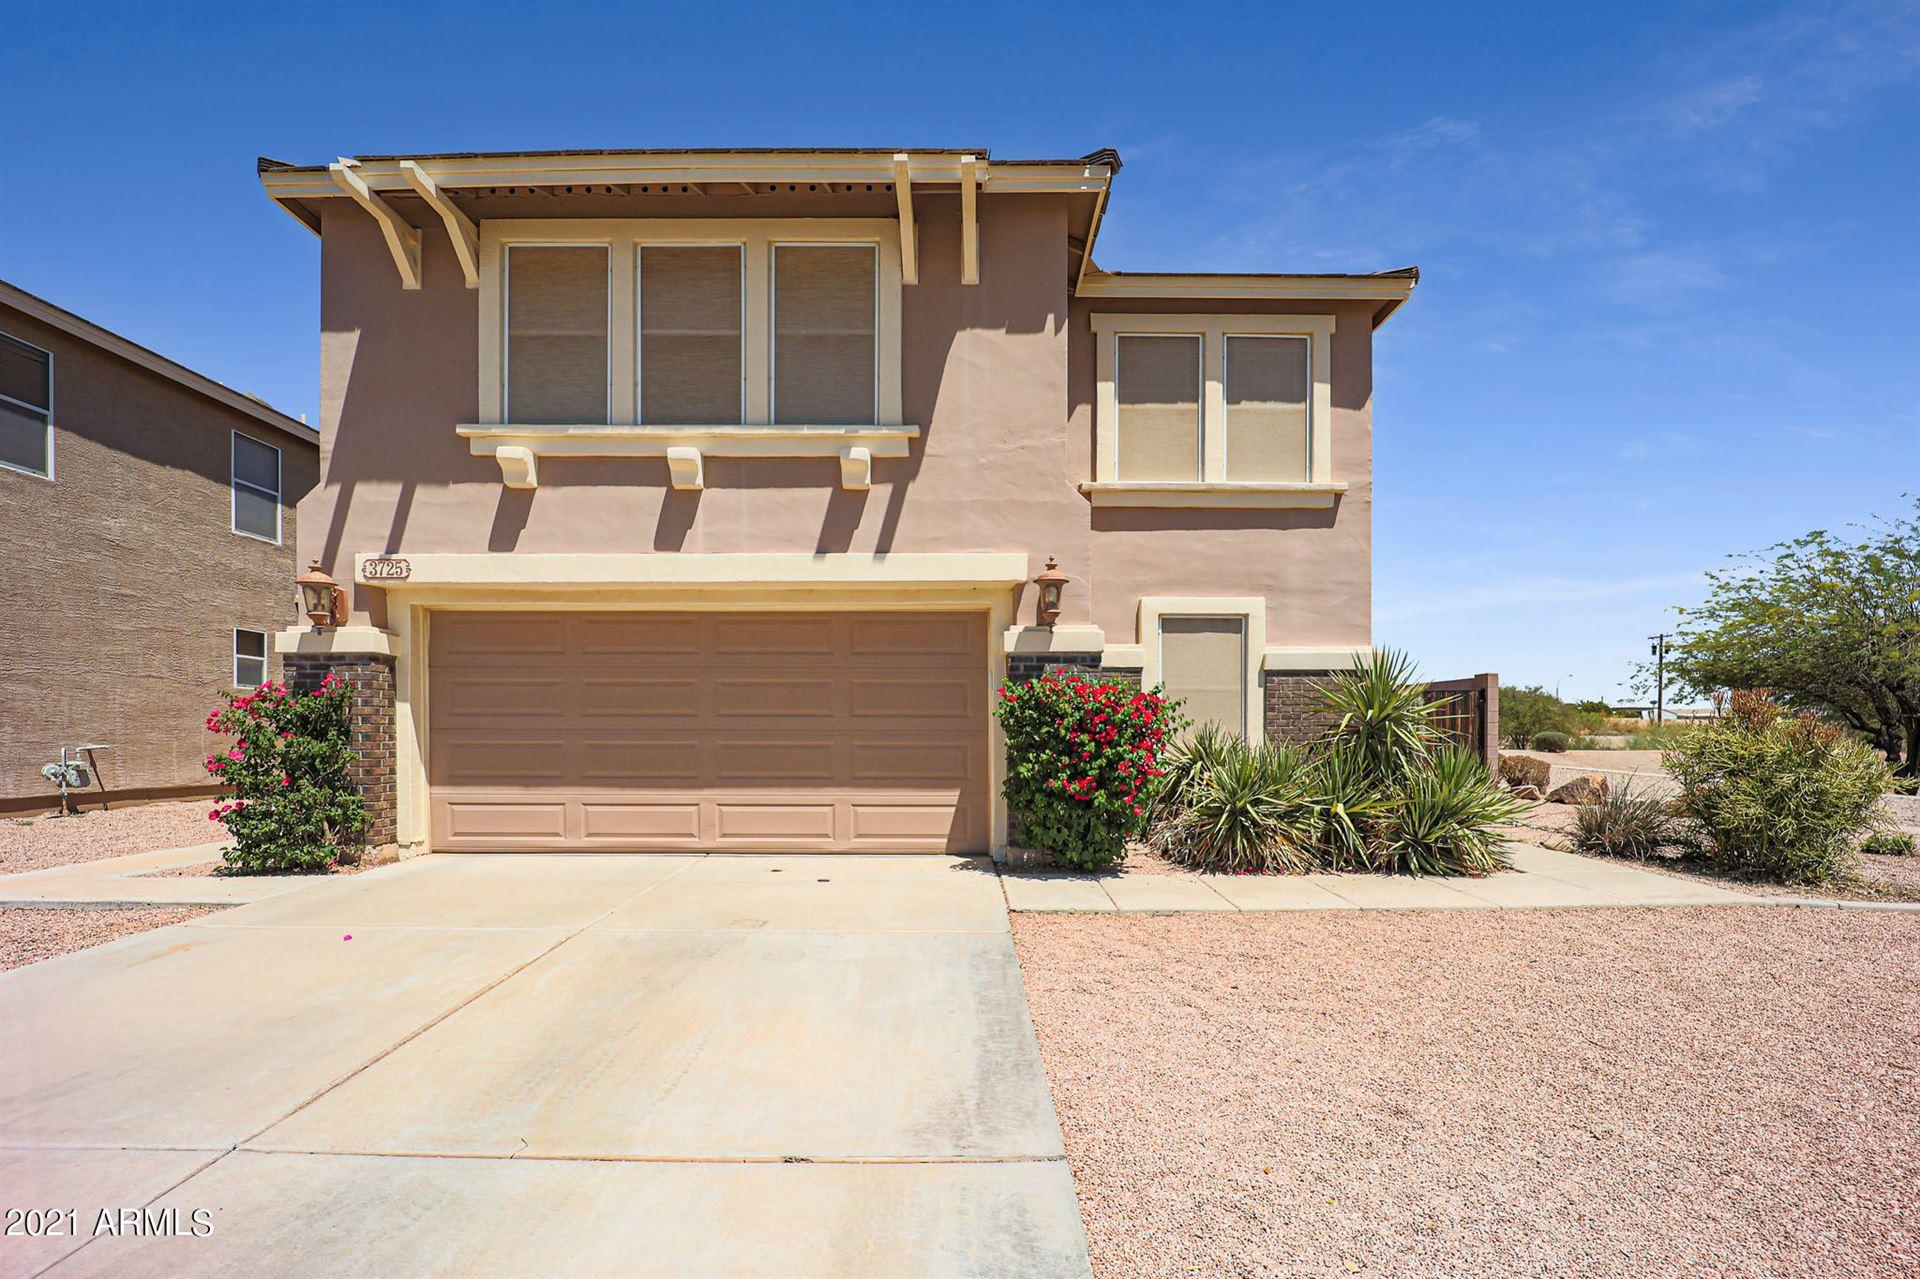 Photo of 3725 S DESERT VIEW Drive, Apache Junction, AZ 85120 (MLS # 6243113)